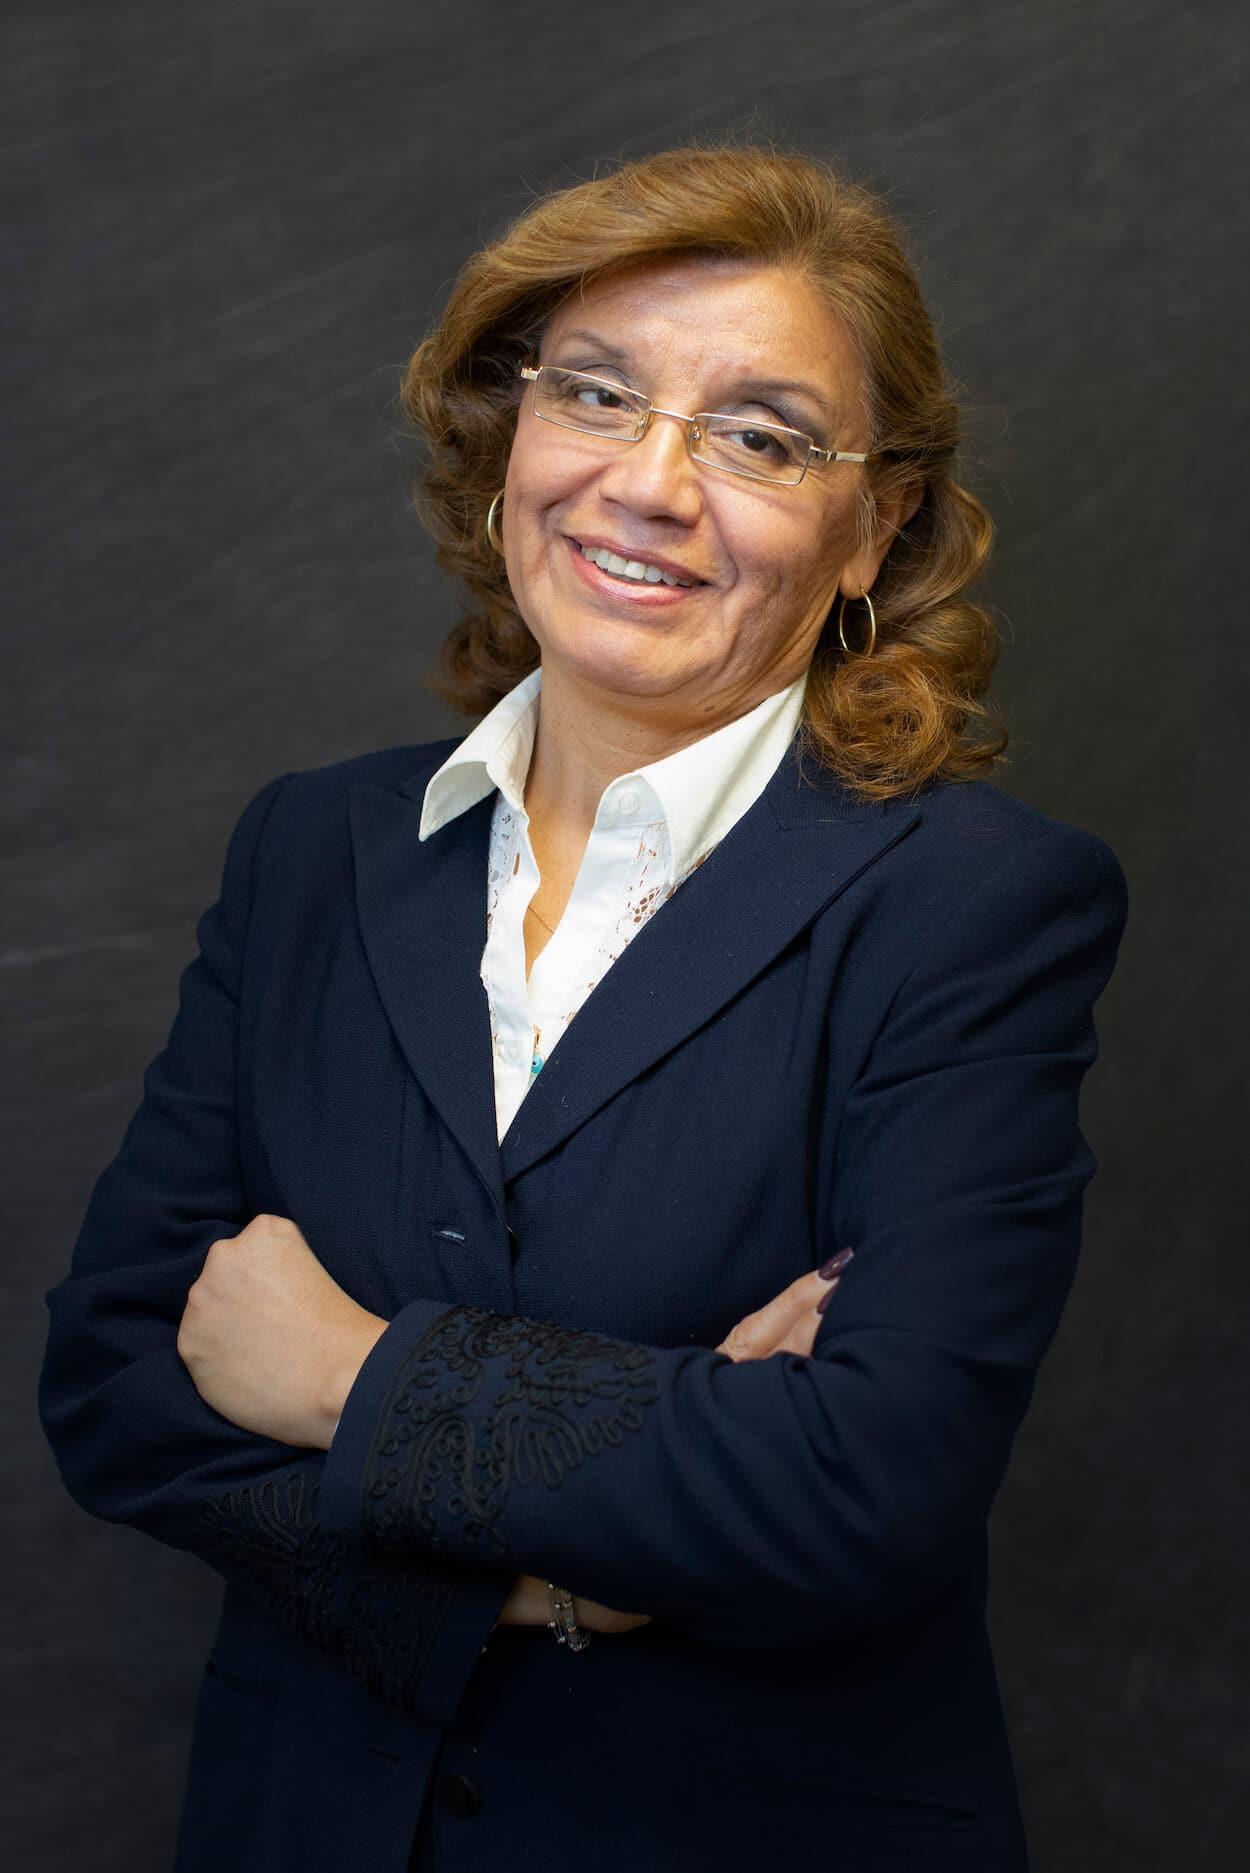 Marisa Connon